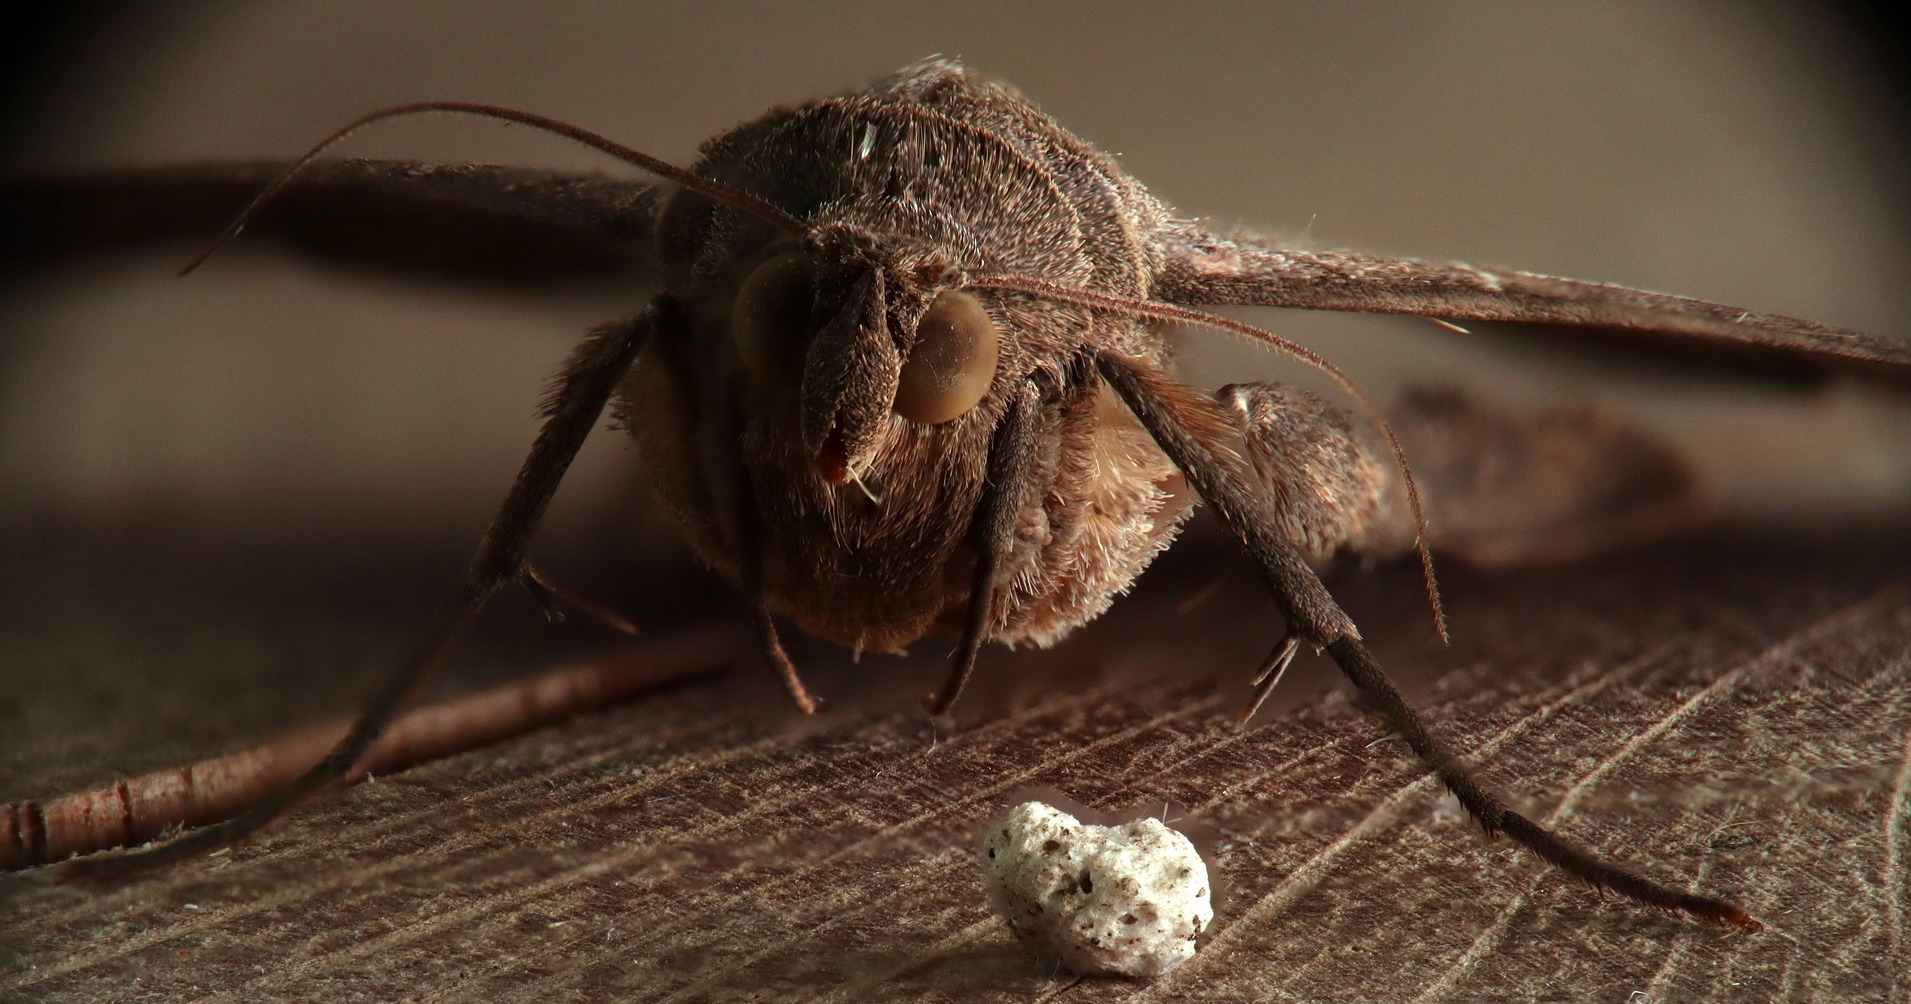 moth-4378908_1920